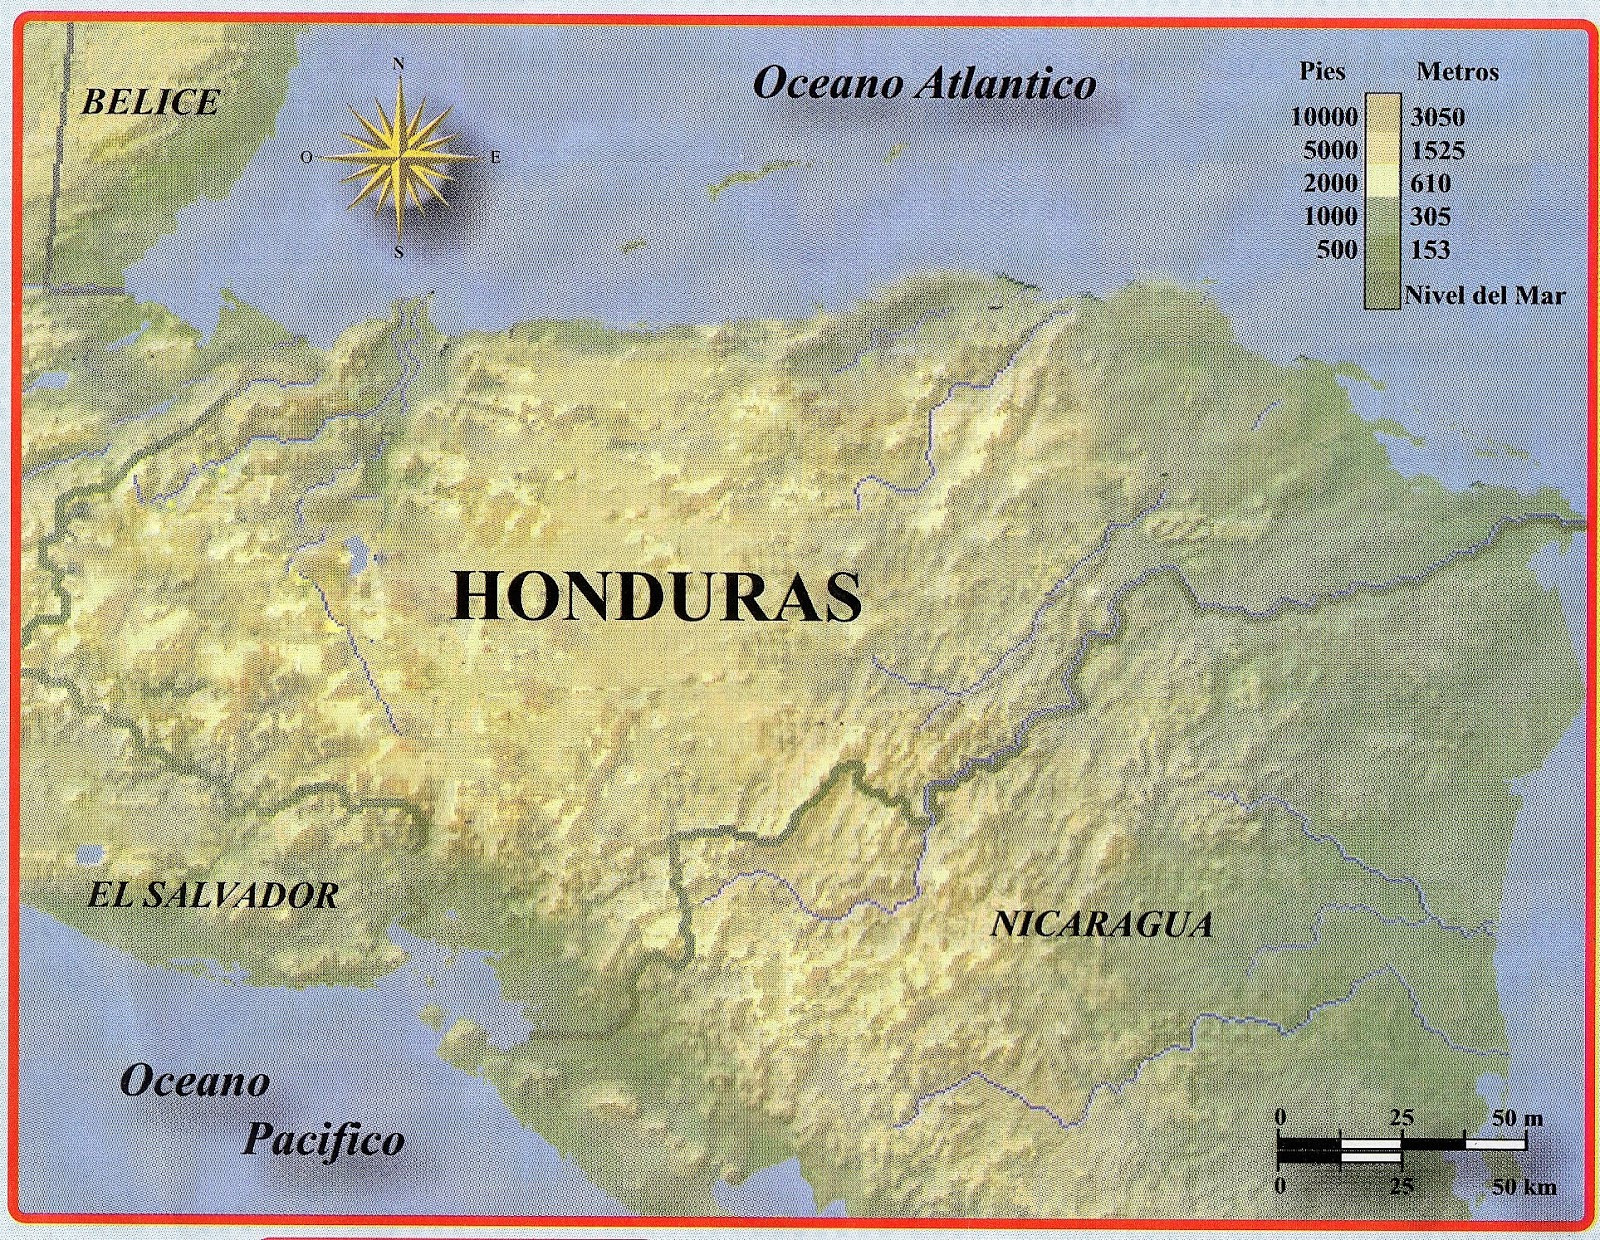 HONDU TAREAS LAS TAREAS DE HONDURAS 040117